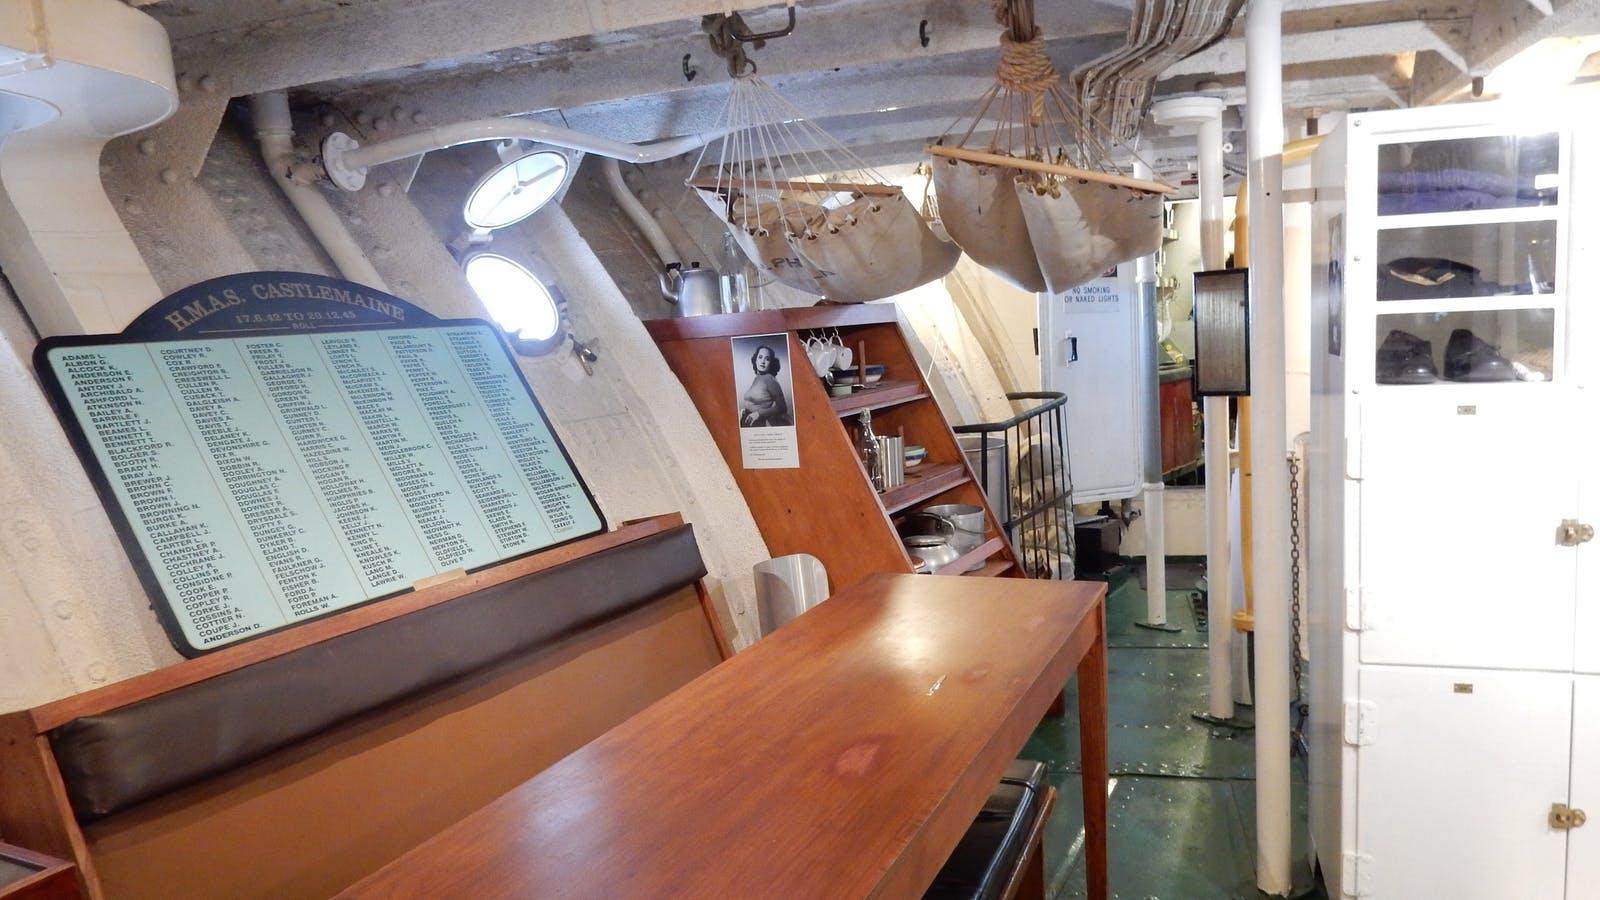 HMAS Castlemaine Museum Ship Mess Deck - Restored Crew Space